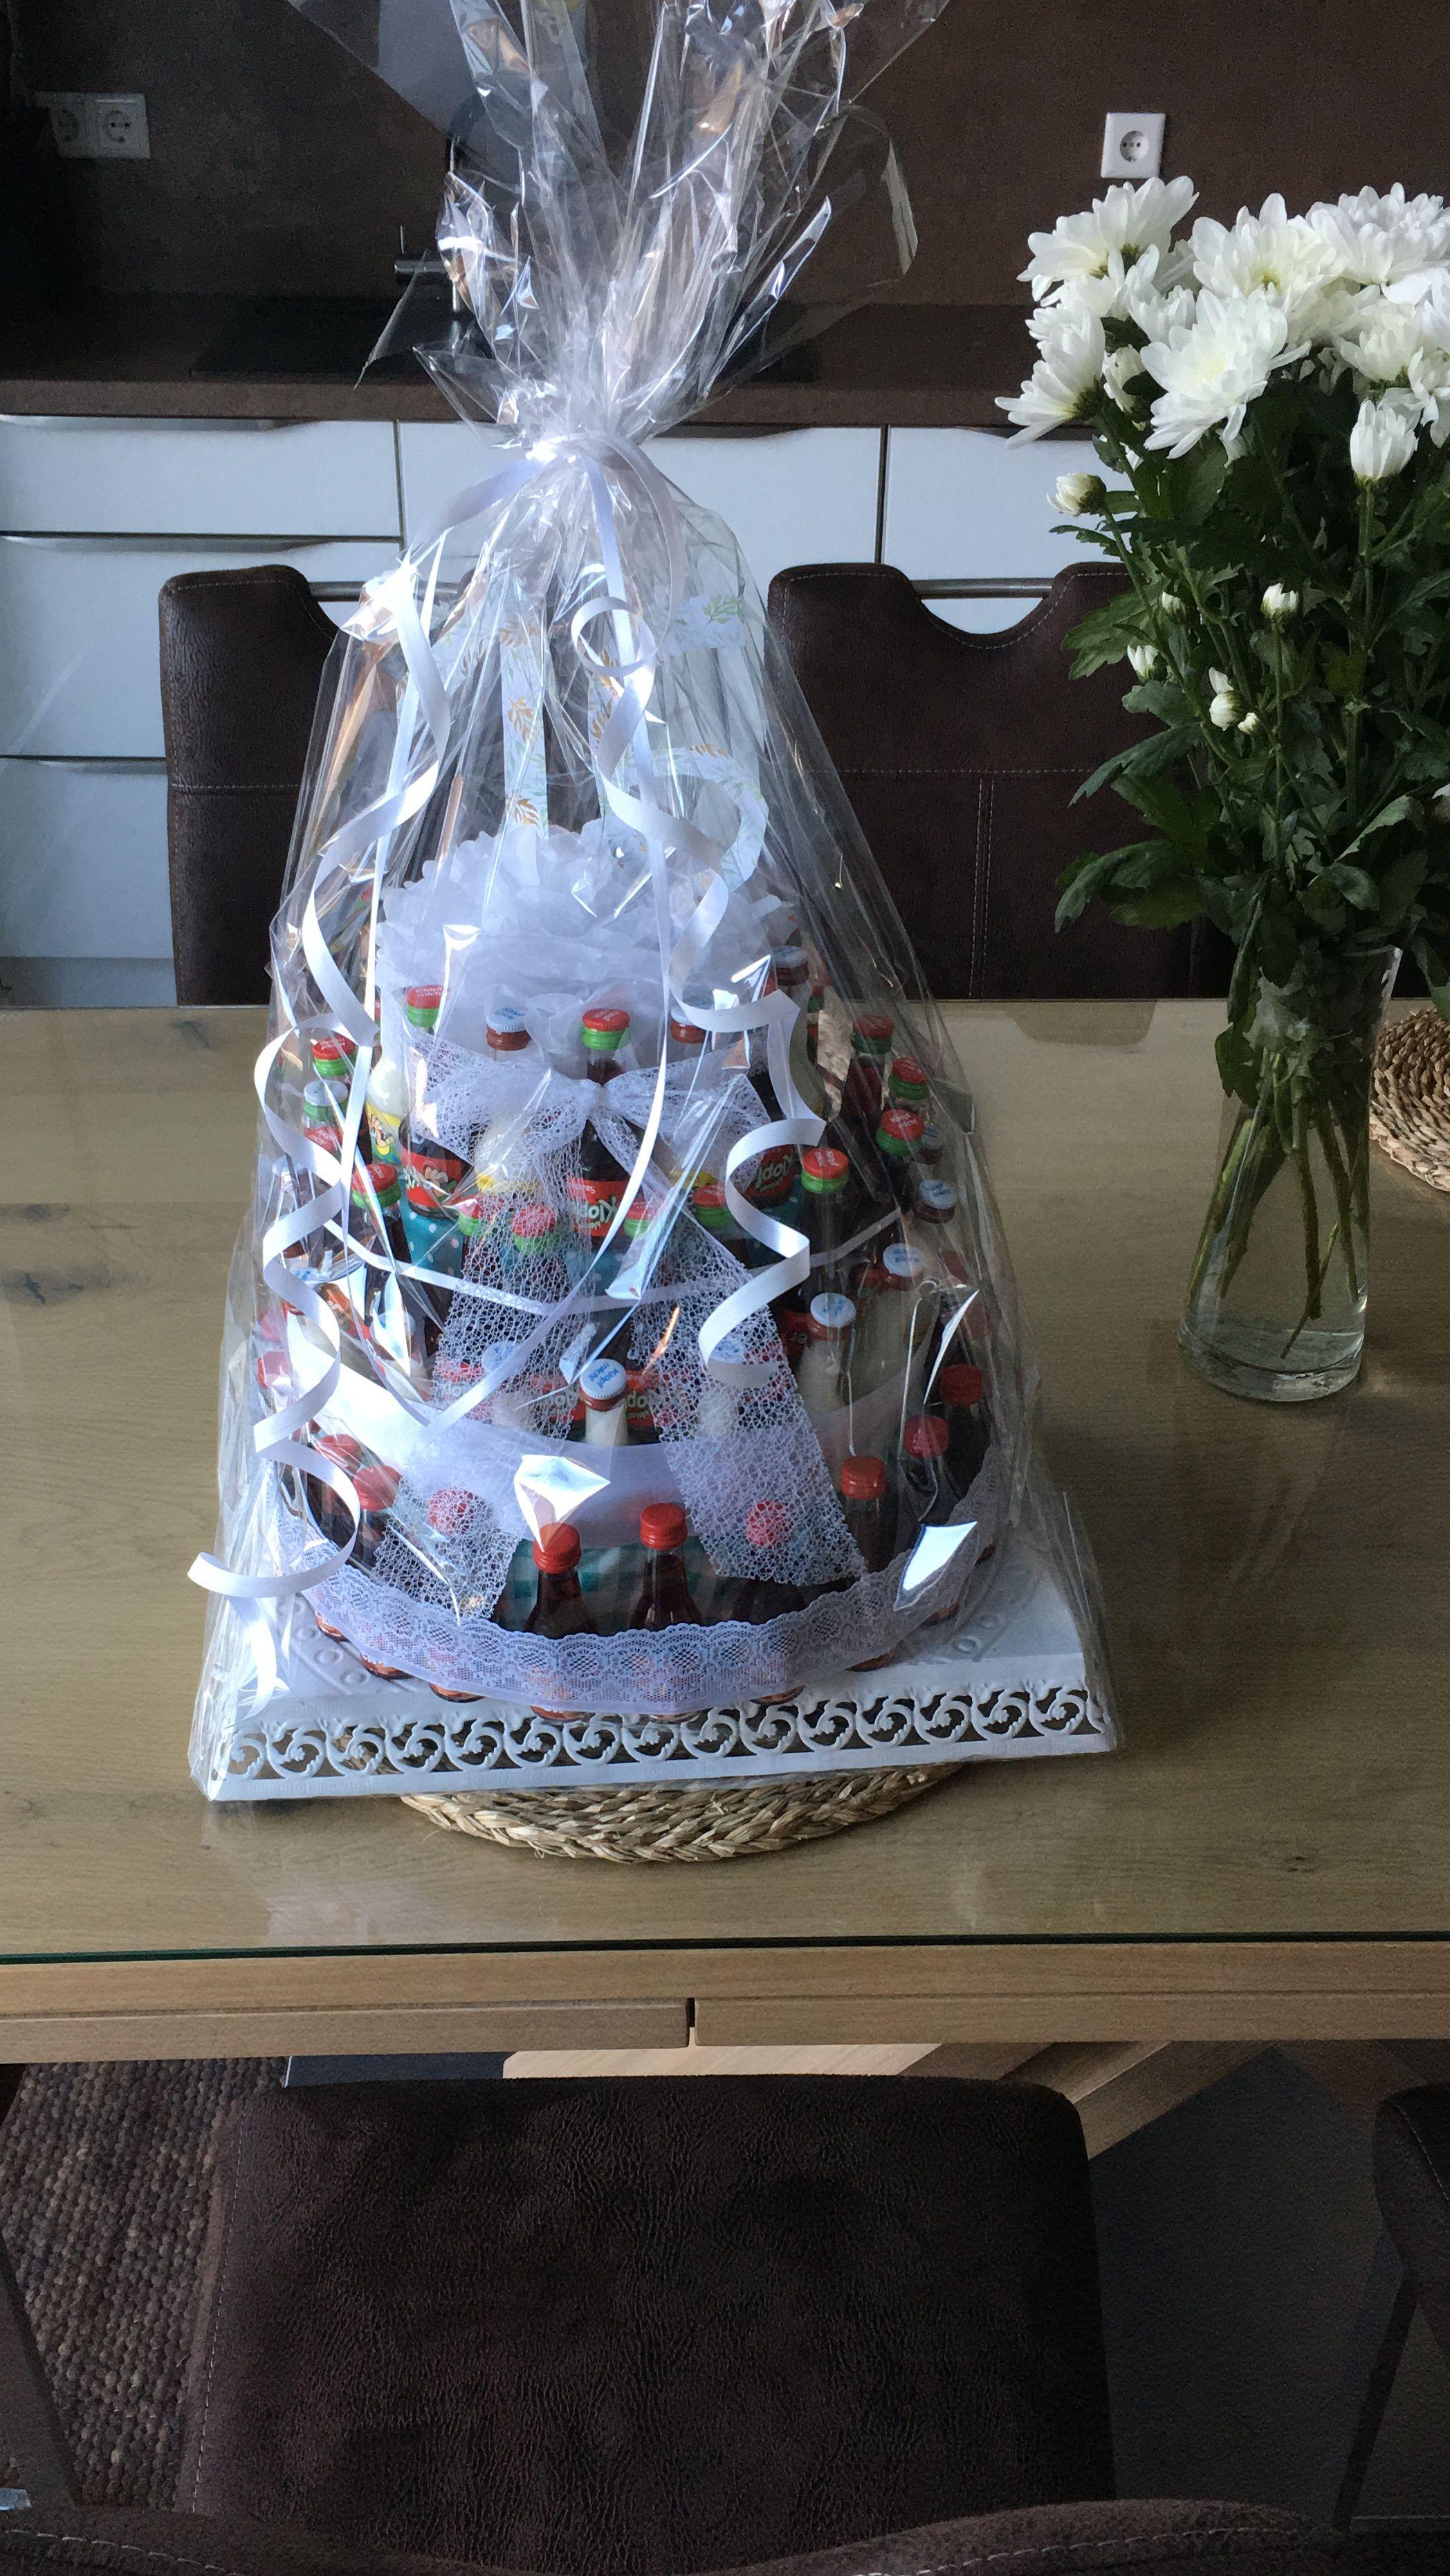 Klopfer Torte Geschenkideen Geschenke Ideen